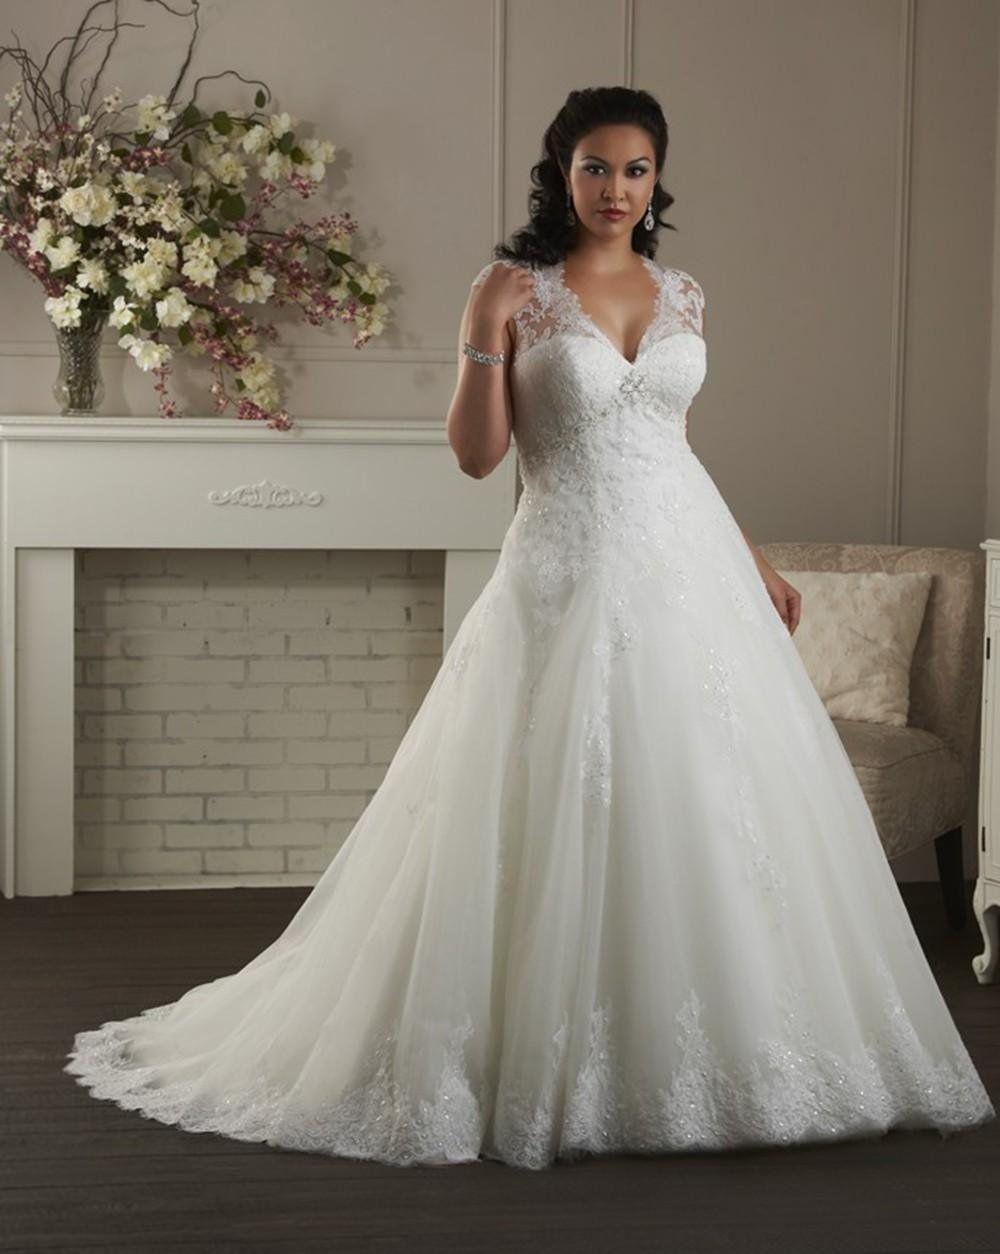 77 Wedding Dresses Milwaukee Plus Size Dresses For Wedding Guest